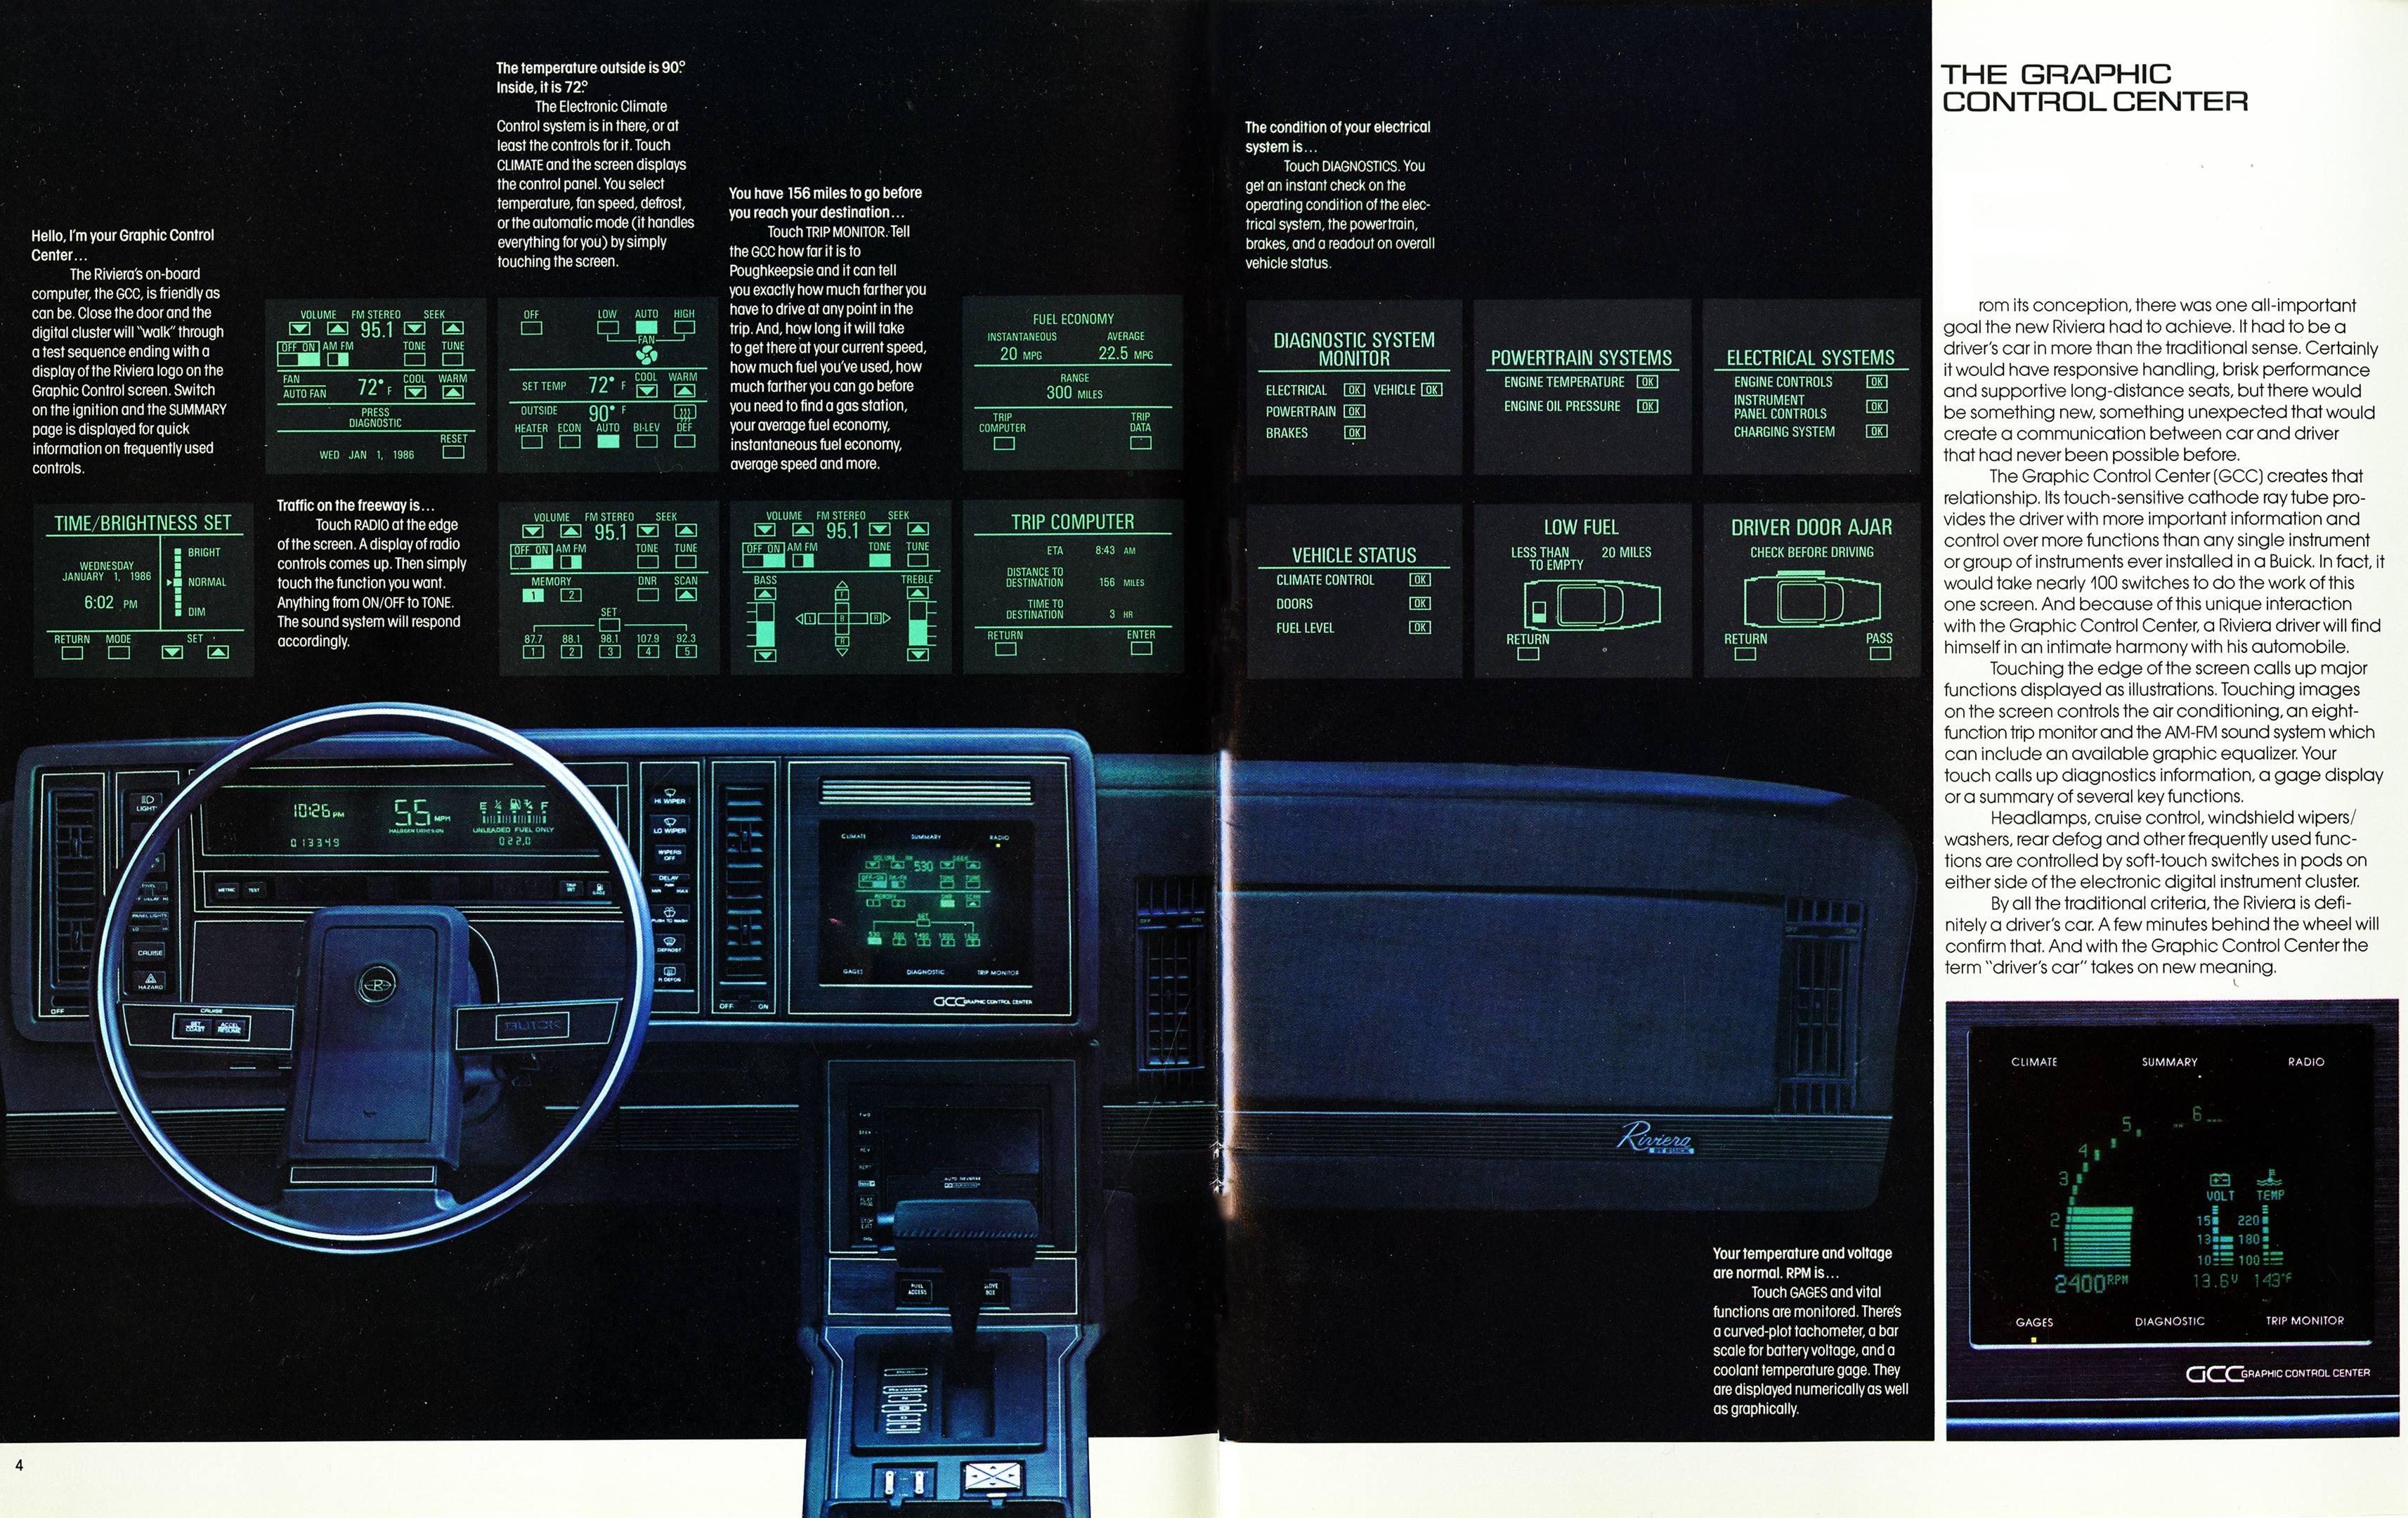 1986 Buick Riviera GCC Touchscreen brochure